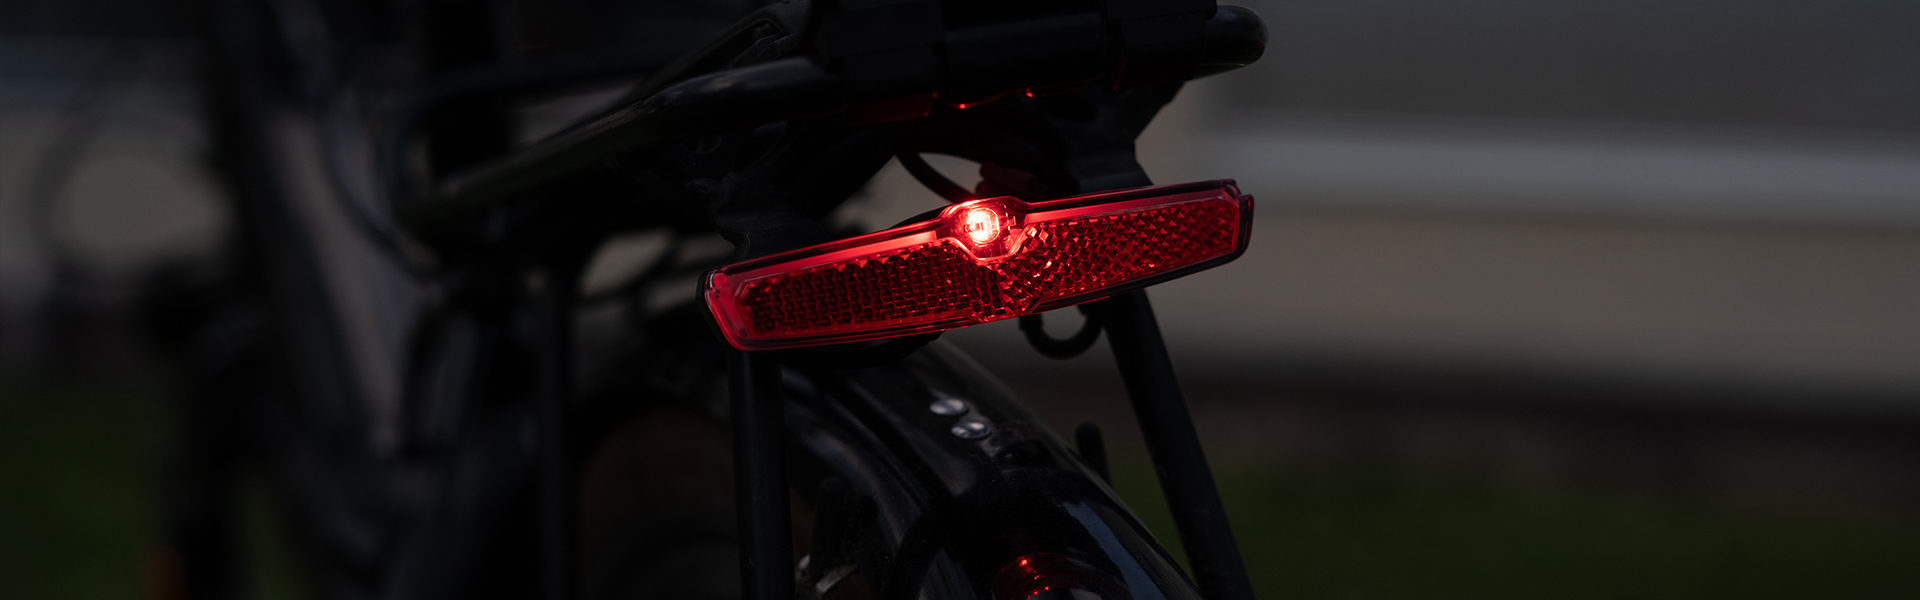 LF-01 Sate-lite USB rechargeable bike headlight/ bicycle light